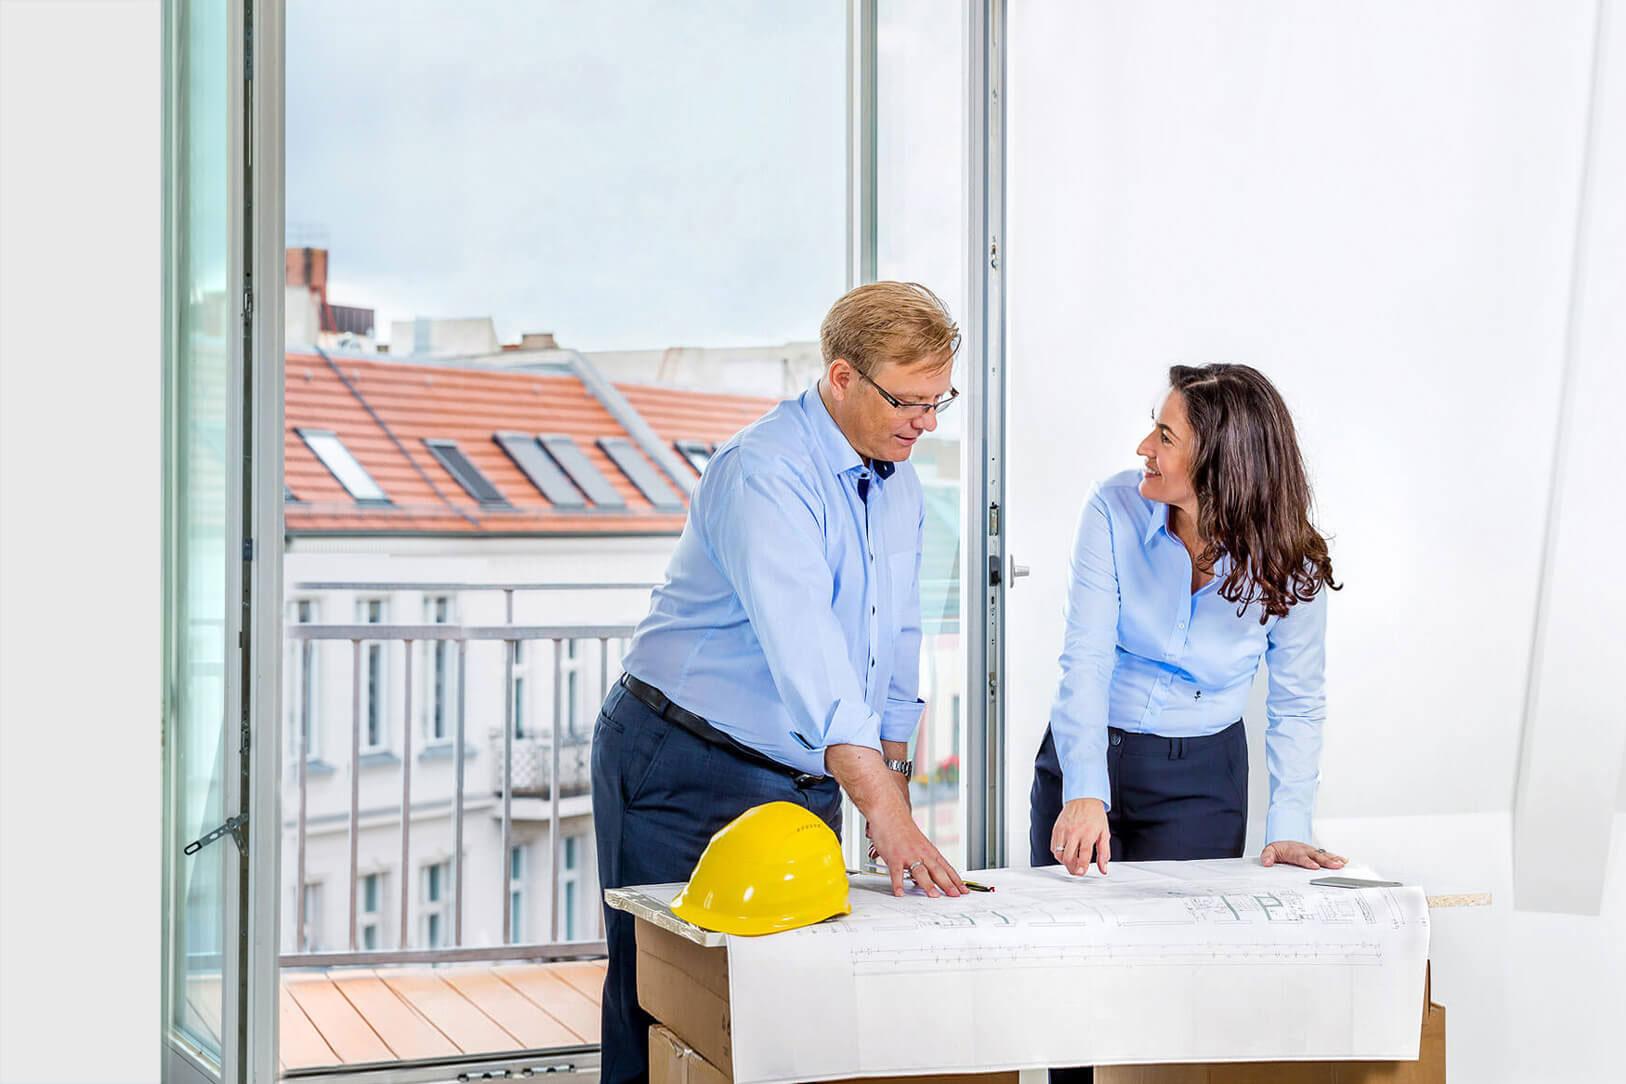 businessfotos-berlin-immobilienfirma-besprechung-arbeitssituation